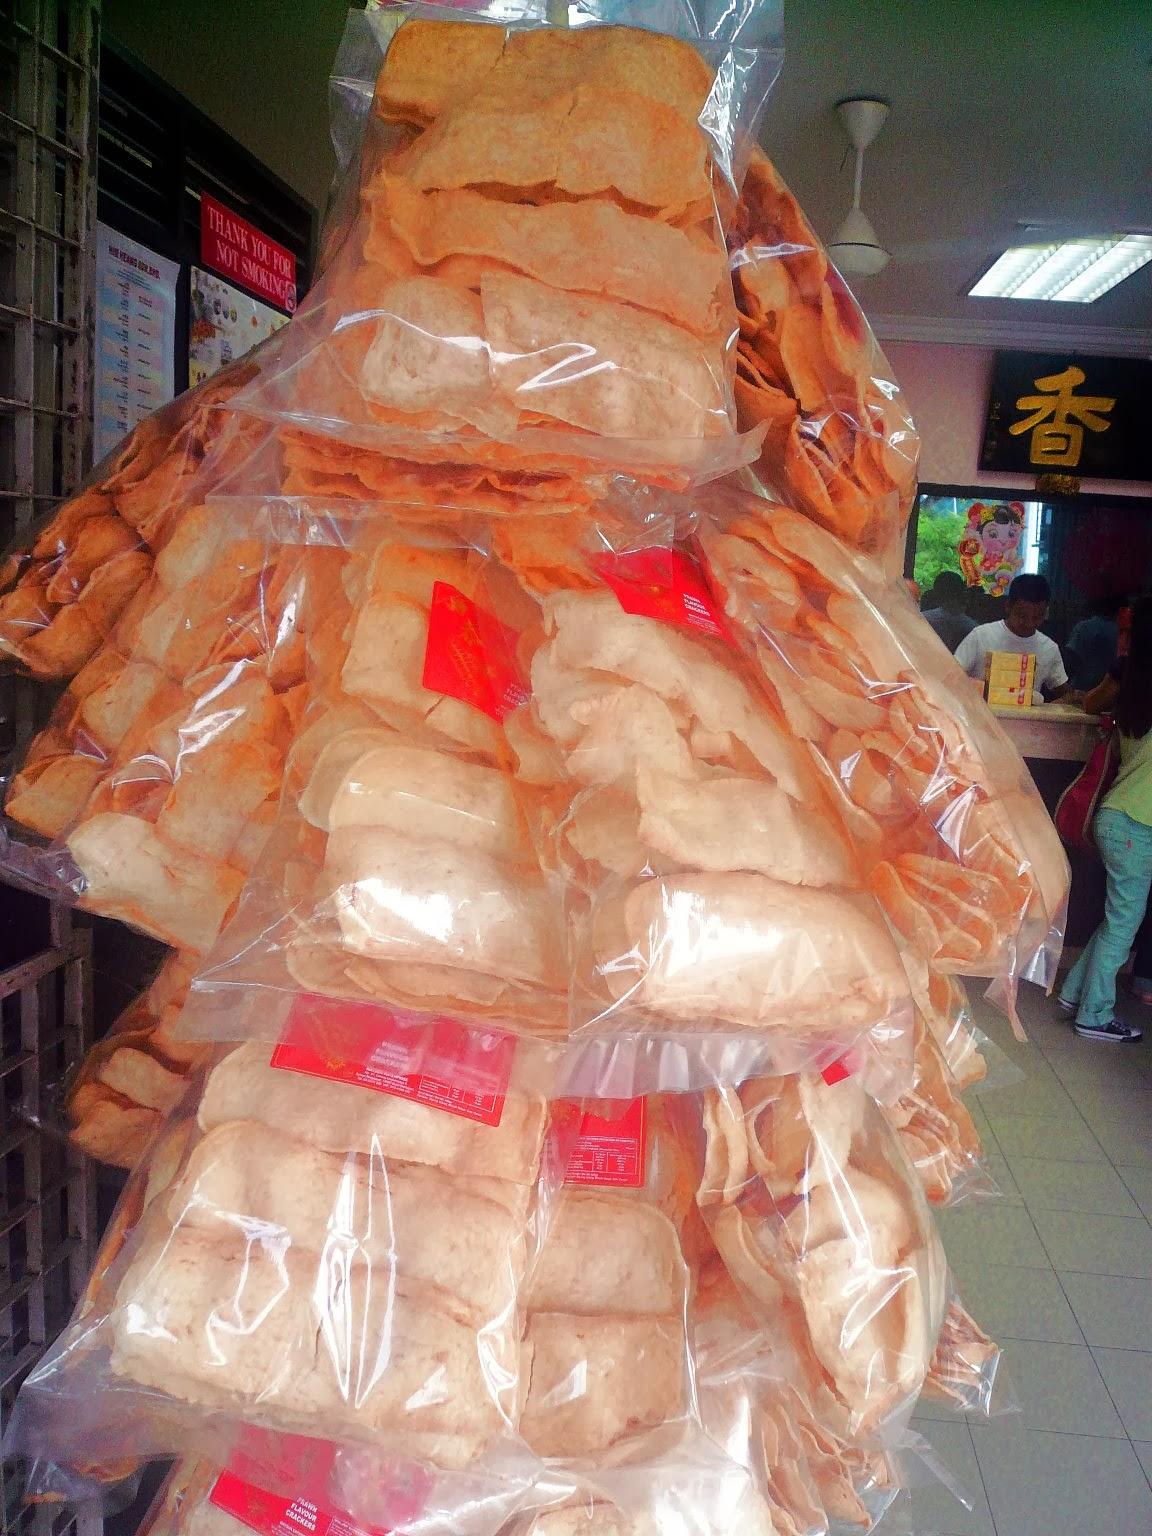 123travelguide.blogspot.com : Penang - Shopping, Foods and ...